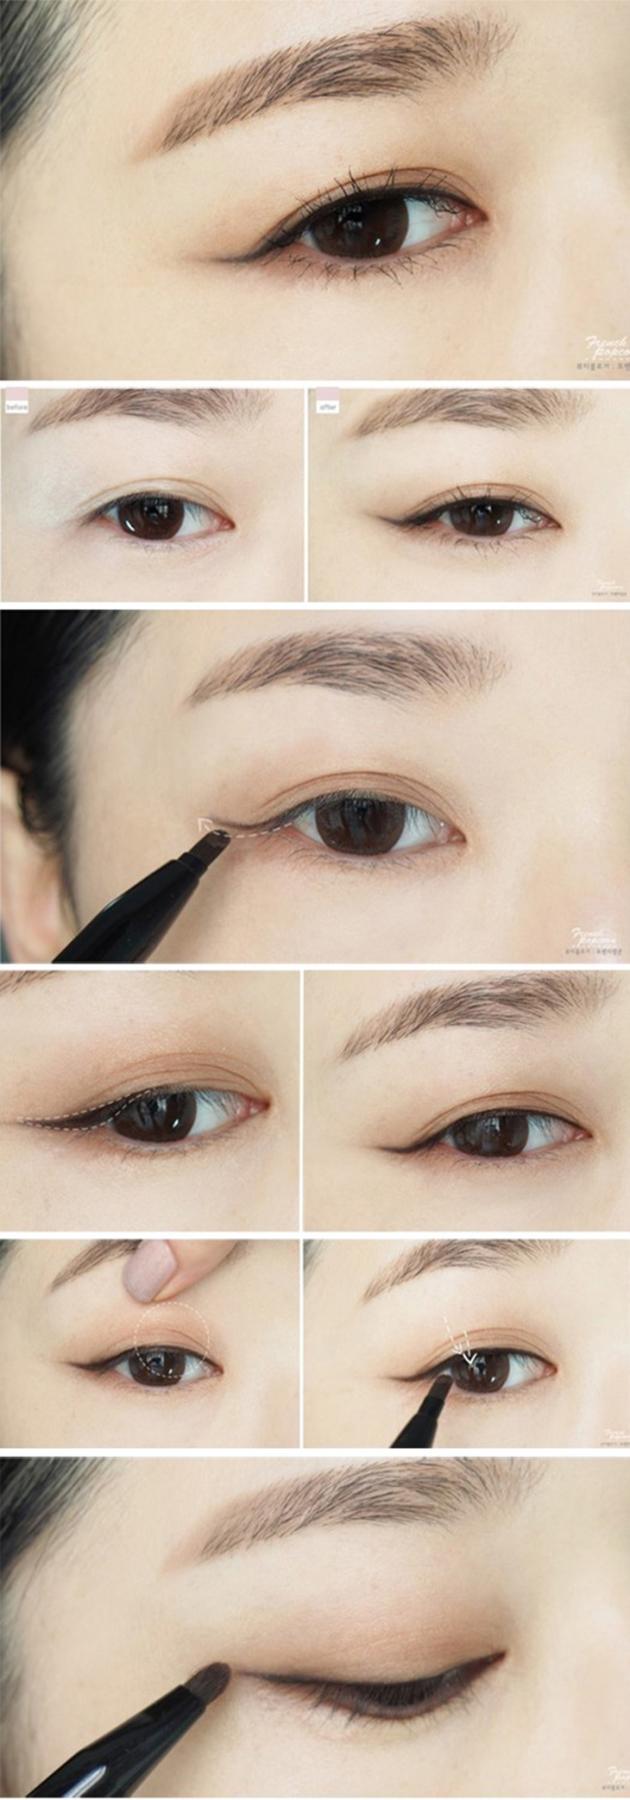 Thin-Eyeliner